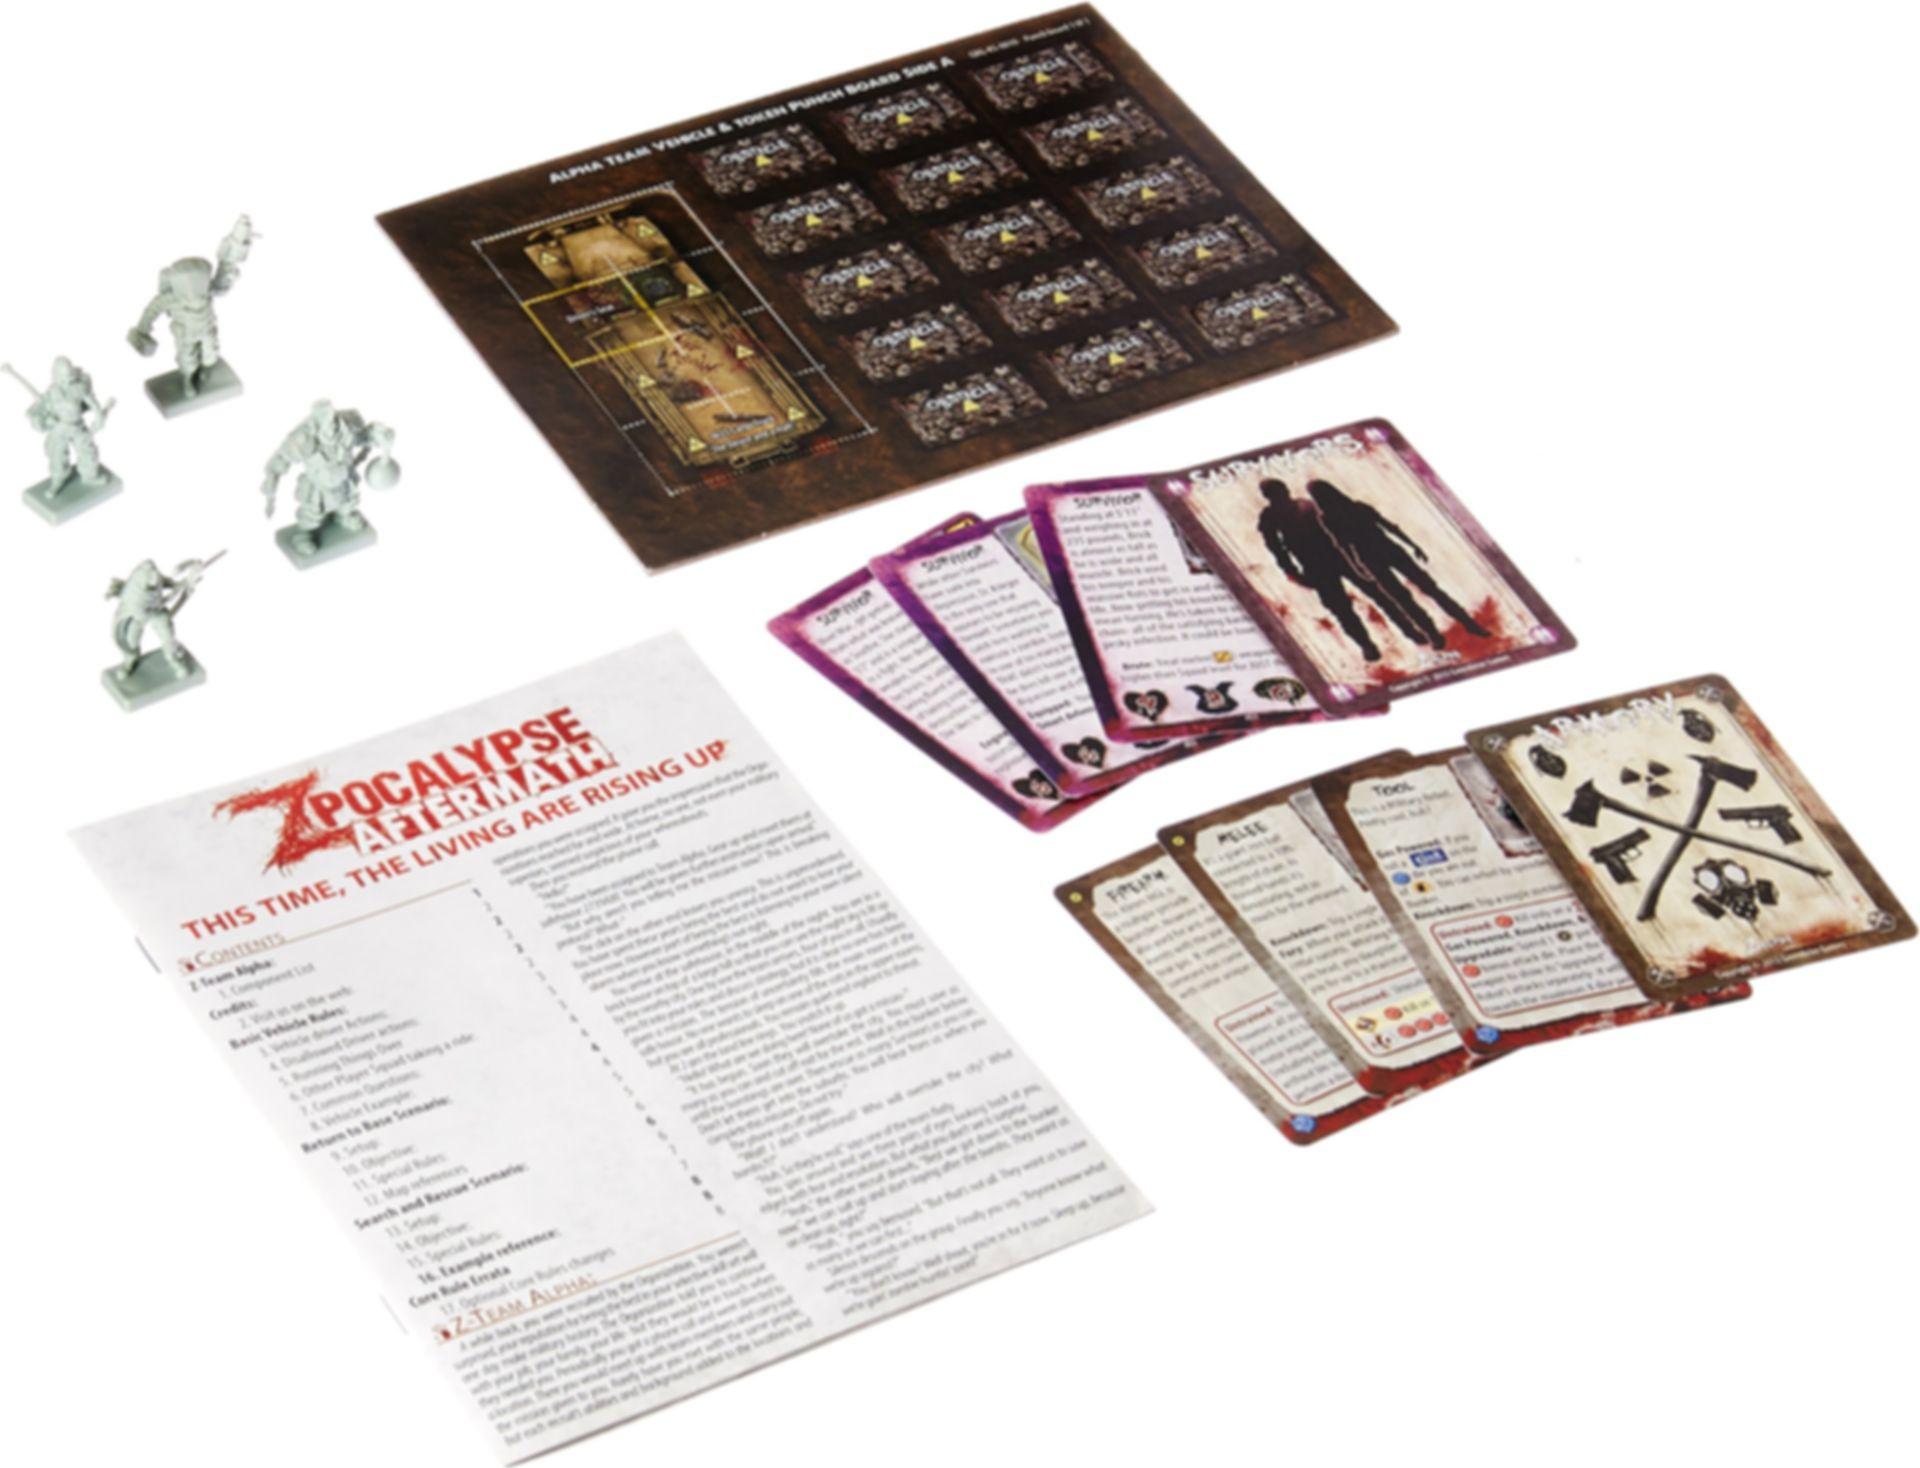 Zpocalypse: Aftermath - Z-Team Alpha Pack components